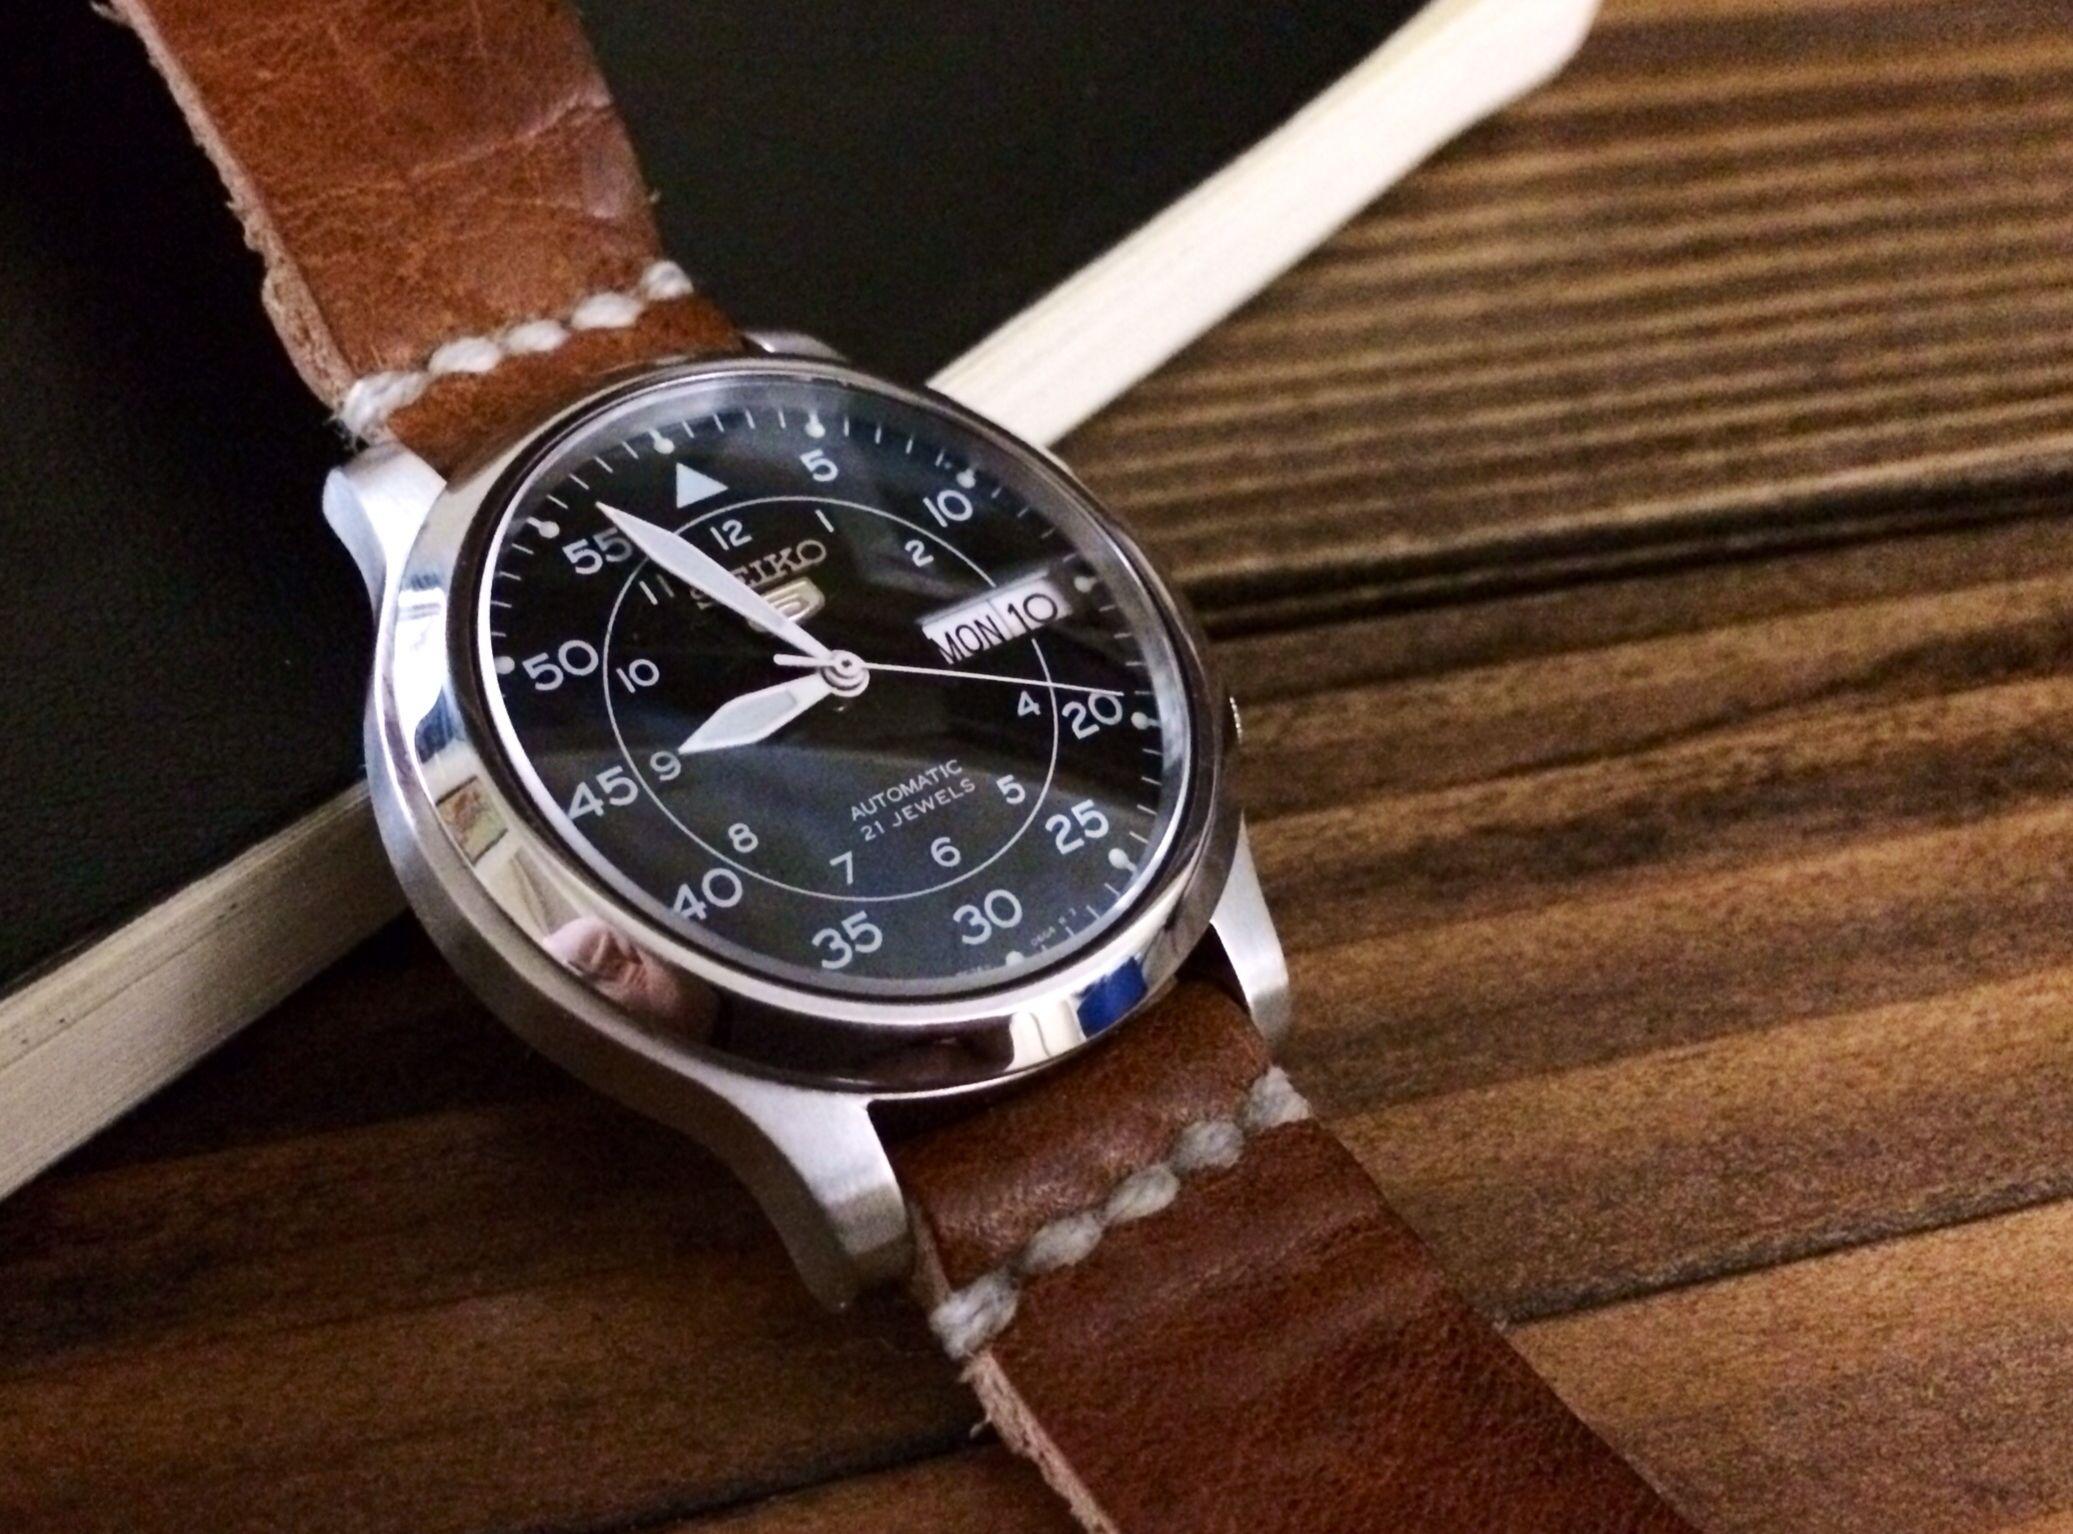 a9abf7163 Custom Seiko 5 pilot watch. | Watches in 2019 | Seiko pilot watch ...